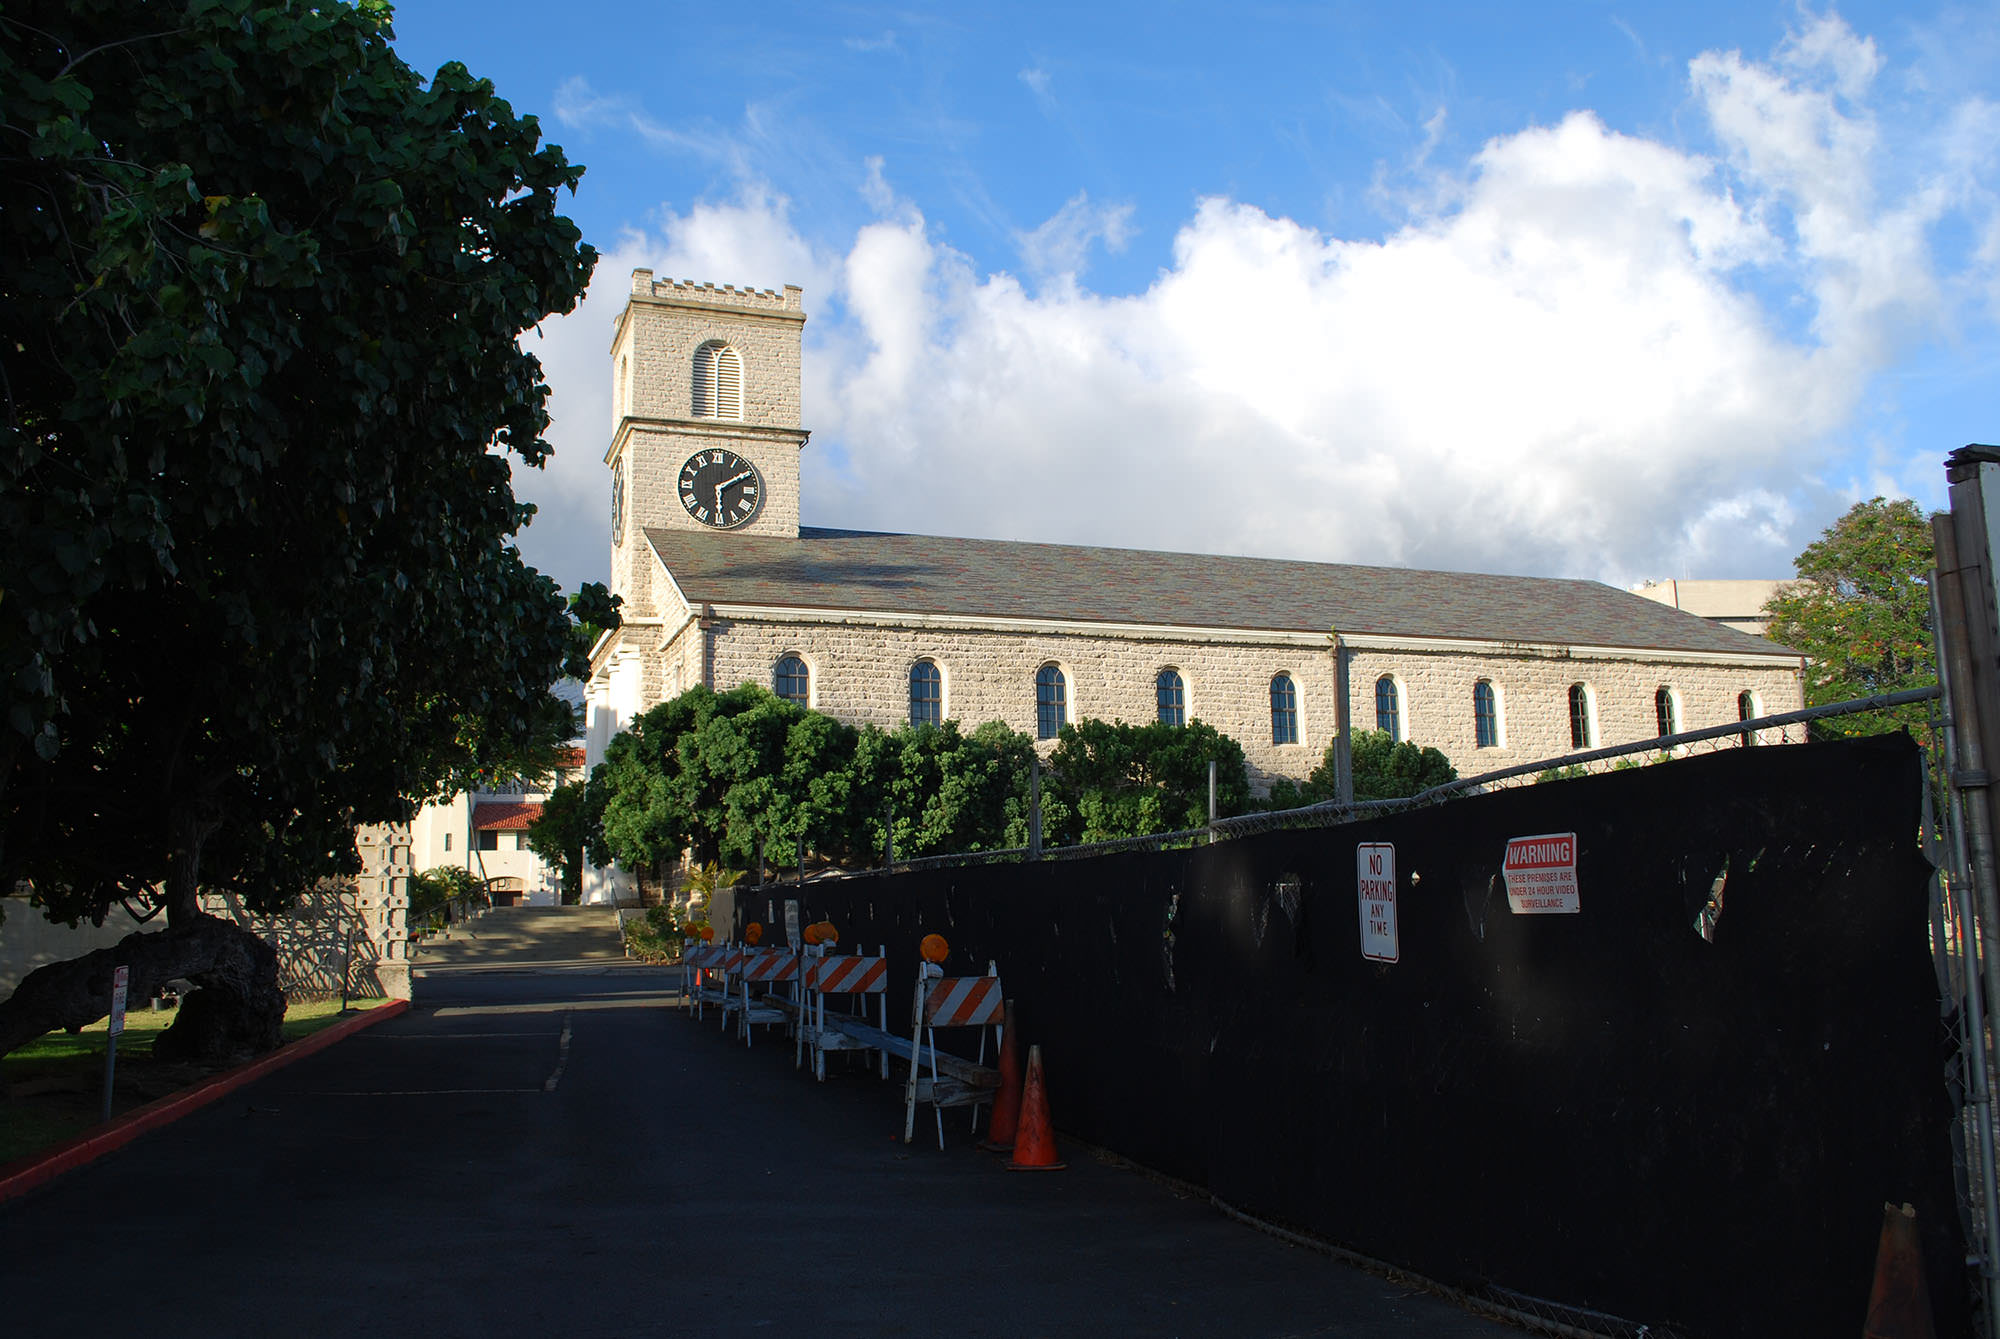 Fig. 2 Kawaiahaʻo Church, Oʻahu, construction site fencing and barricades, July 2014. Photo: ©Sally Promey